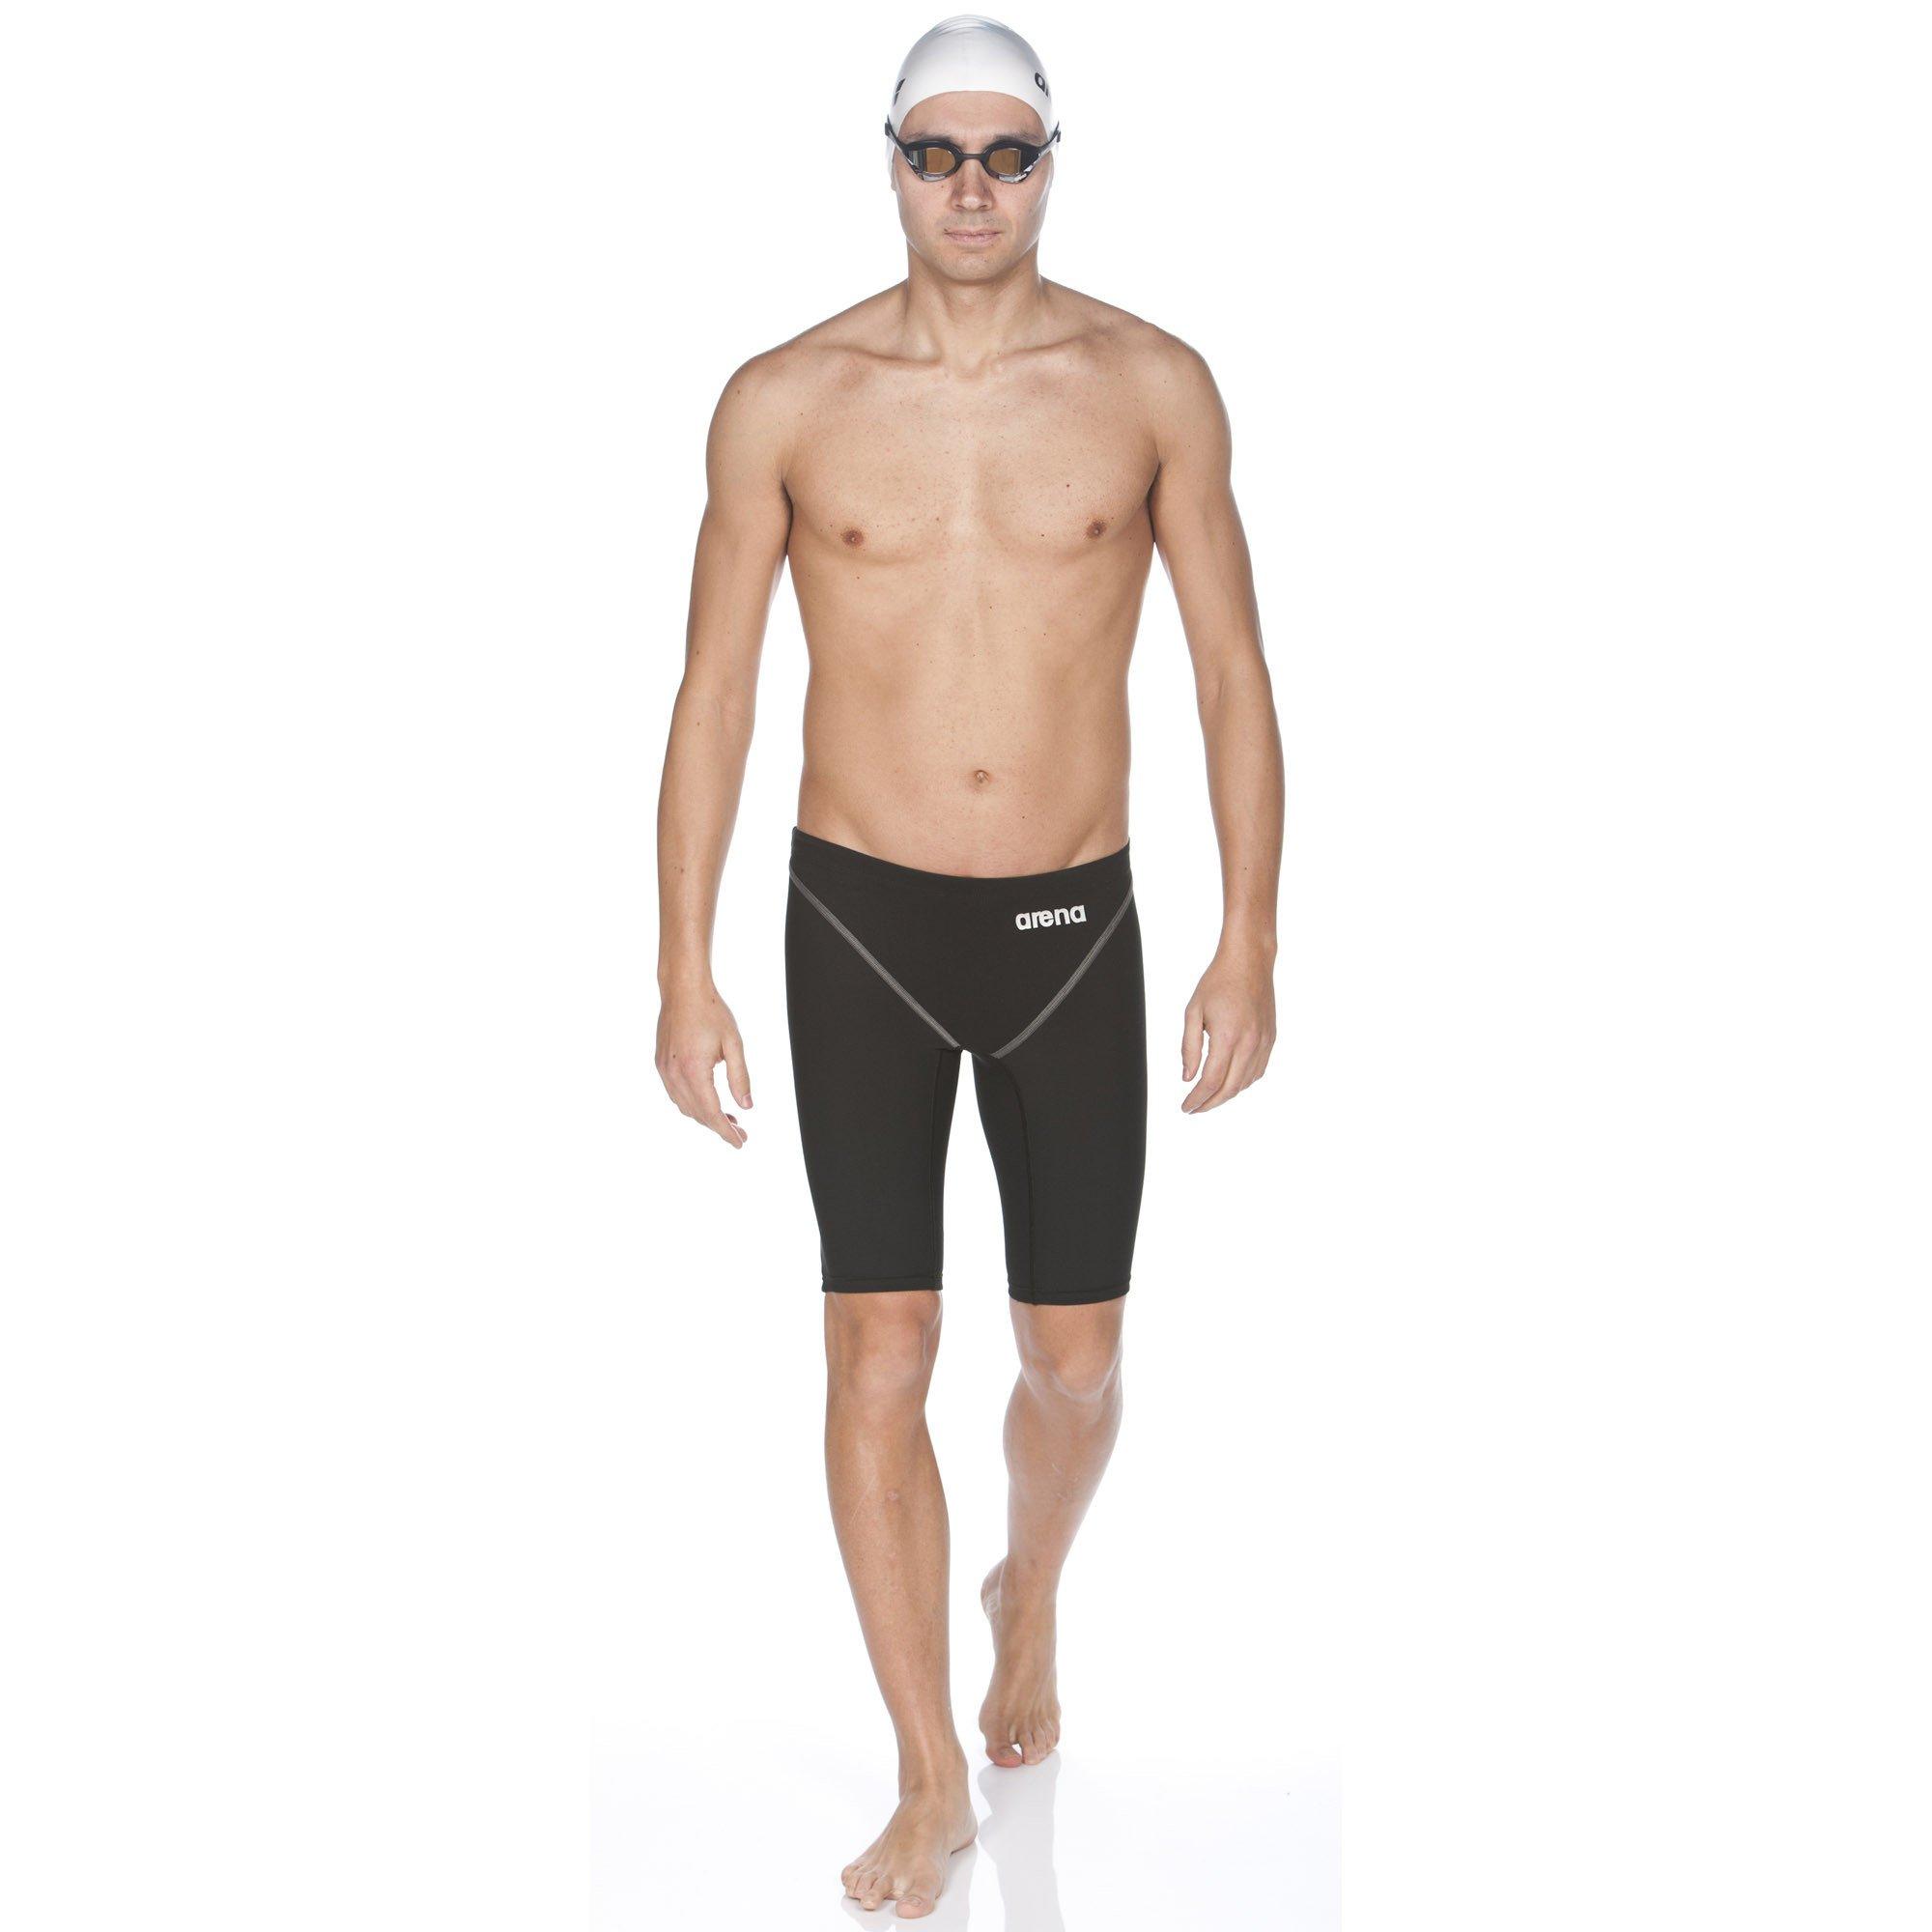 Arena Powerskin ST 2.0 Jammer Men's Racing Swimsuit, Black, 30